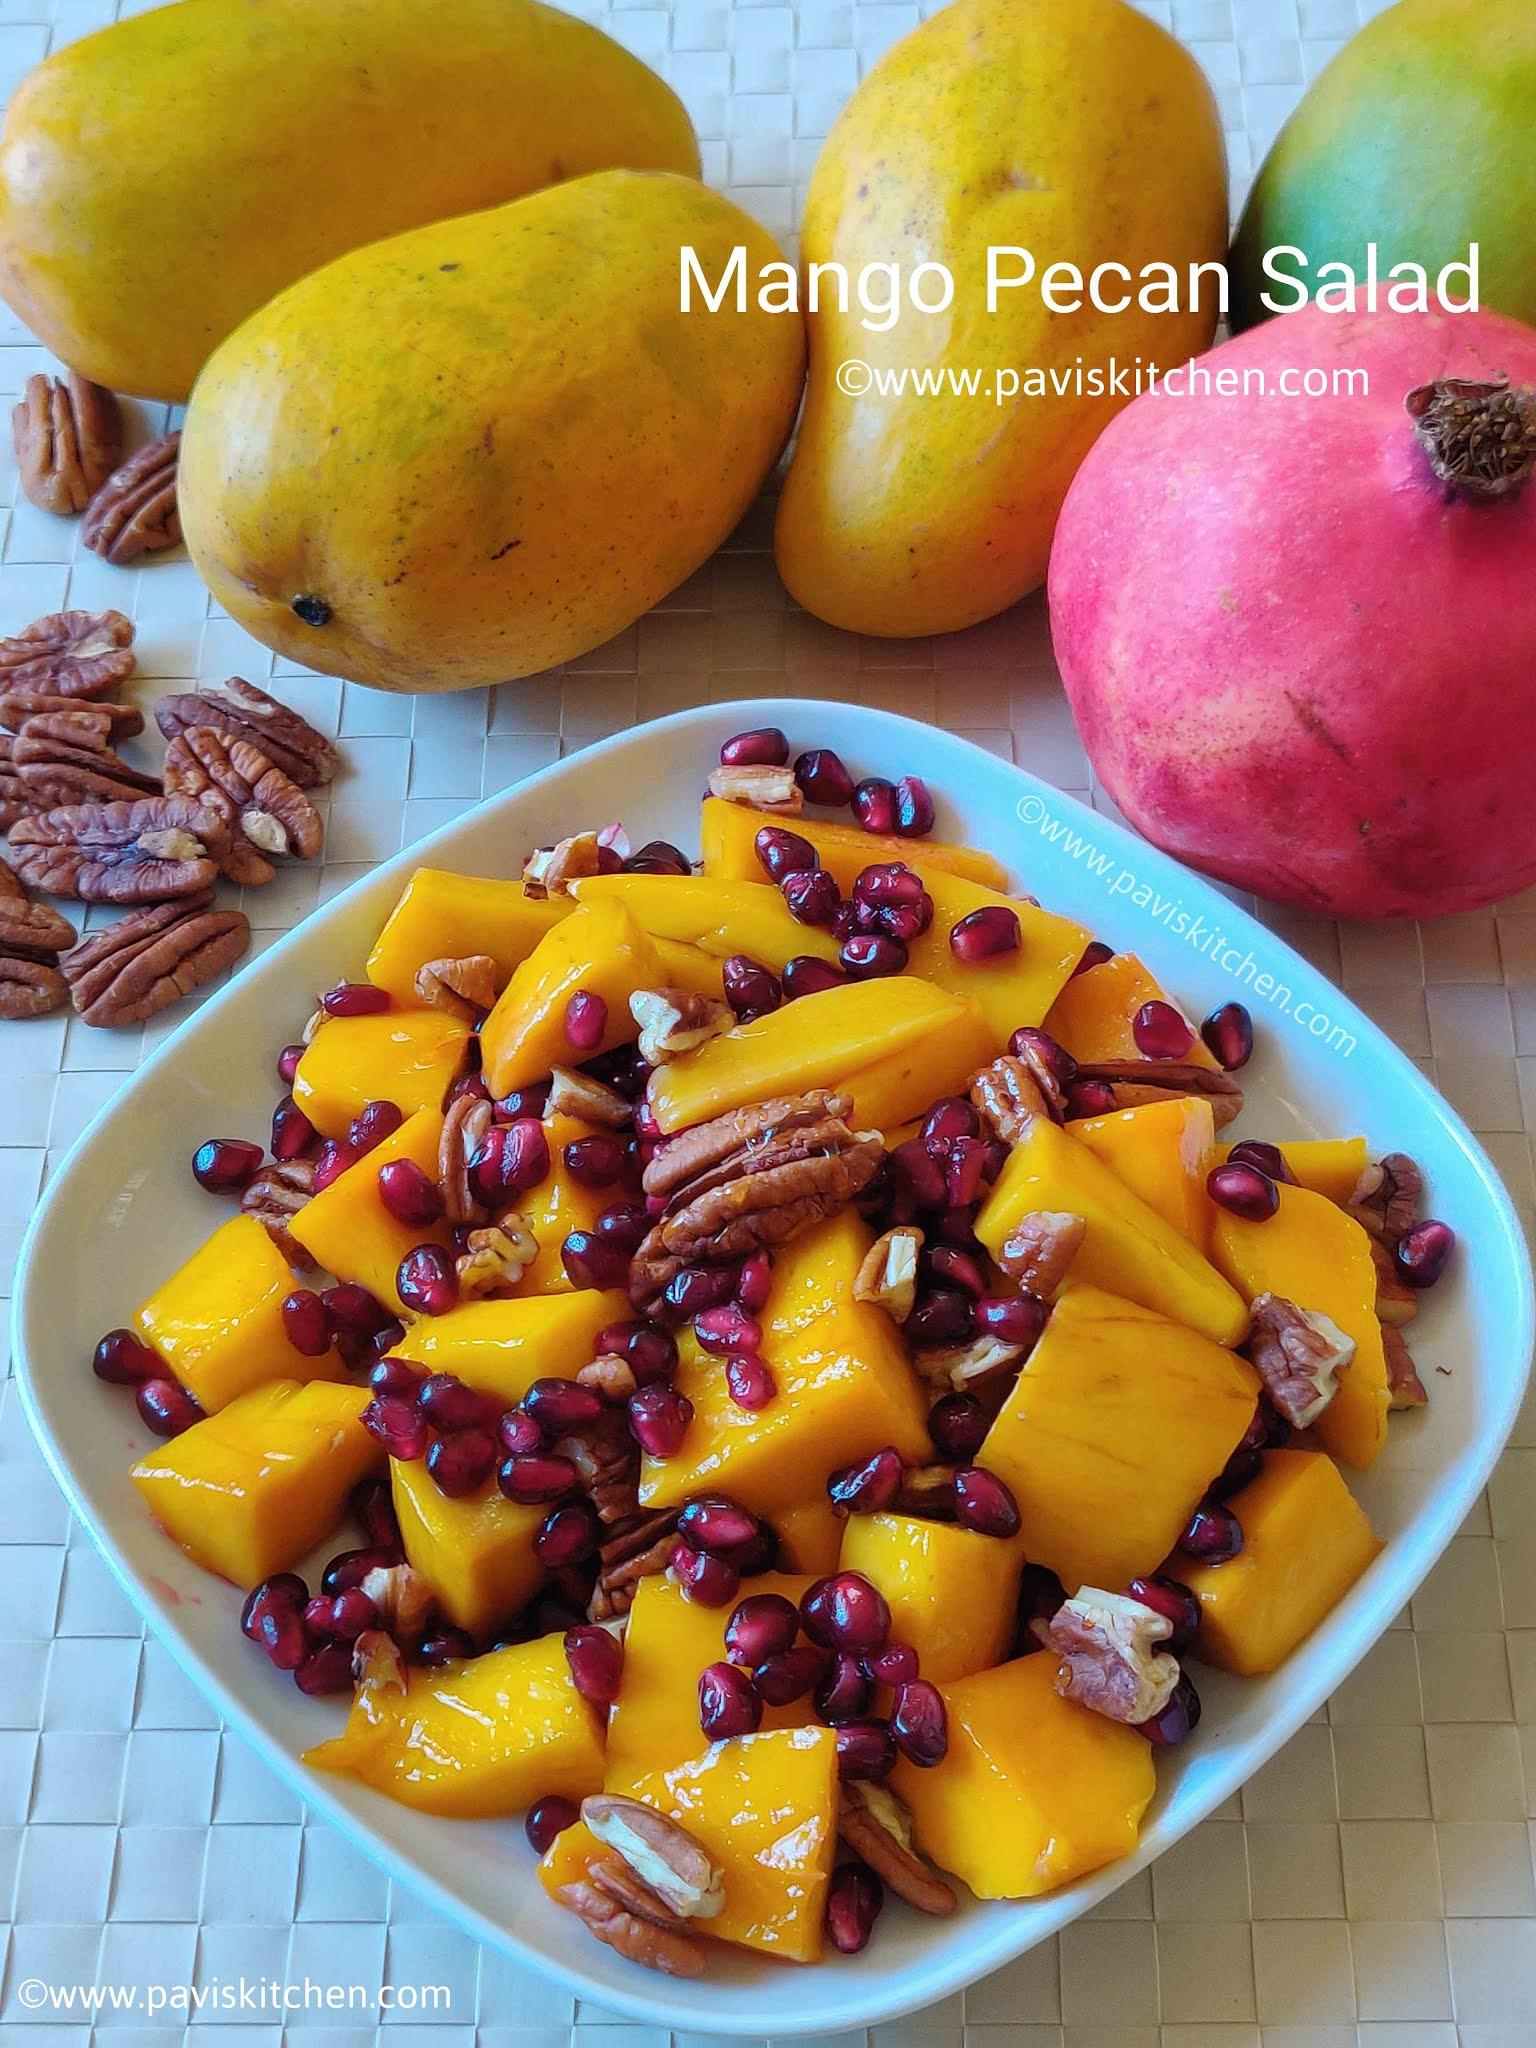 Mango salad recipe | Indian mango fruit salad | mango pecan salad | mango pomegranate fruit salad